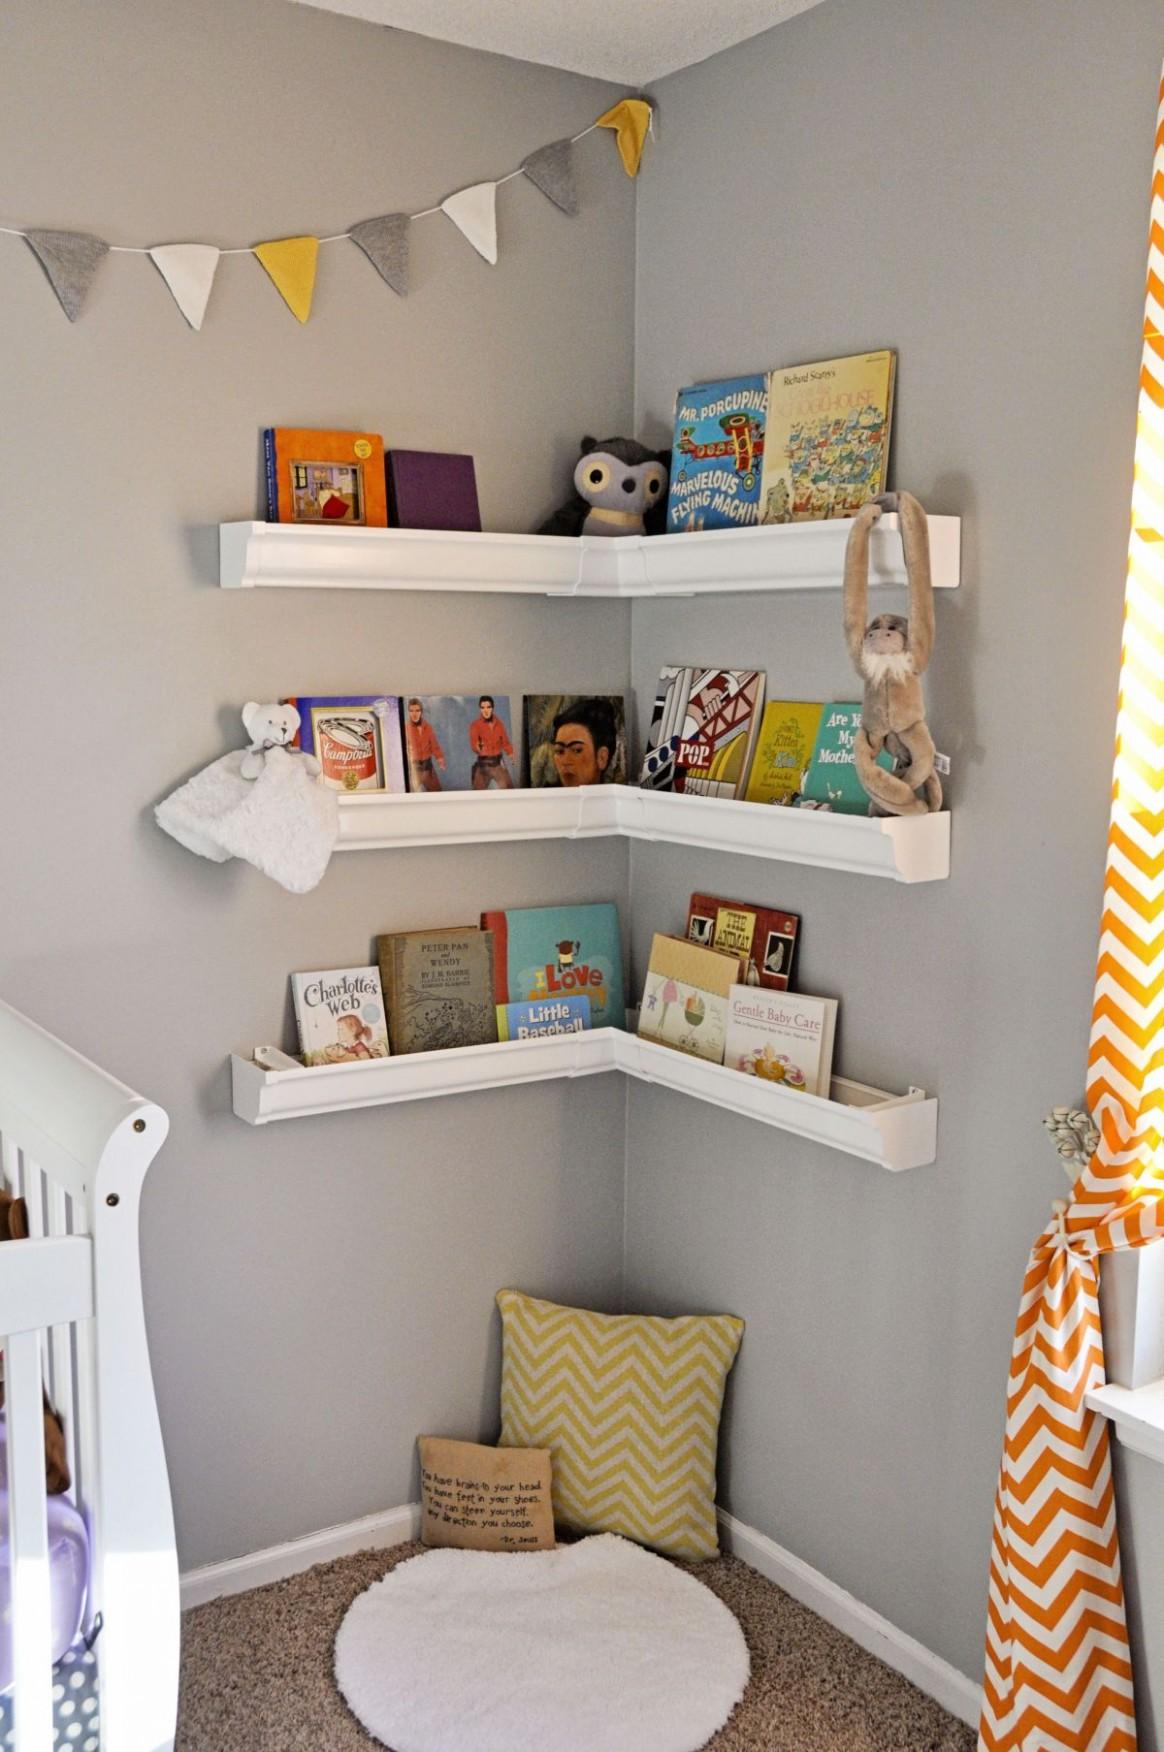 Nursery Bookshelf Ideas With Cute And Playful Designs - Baby Room Bookshelf